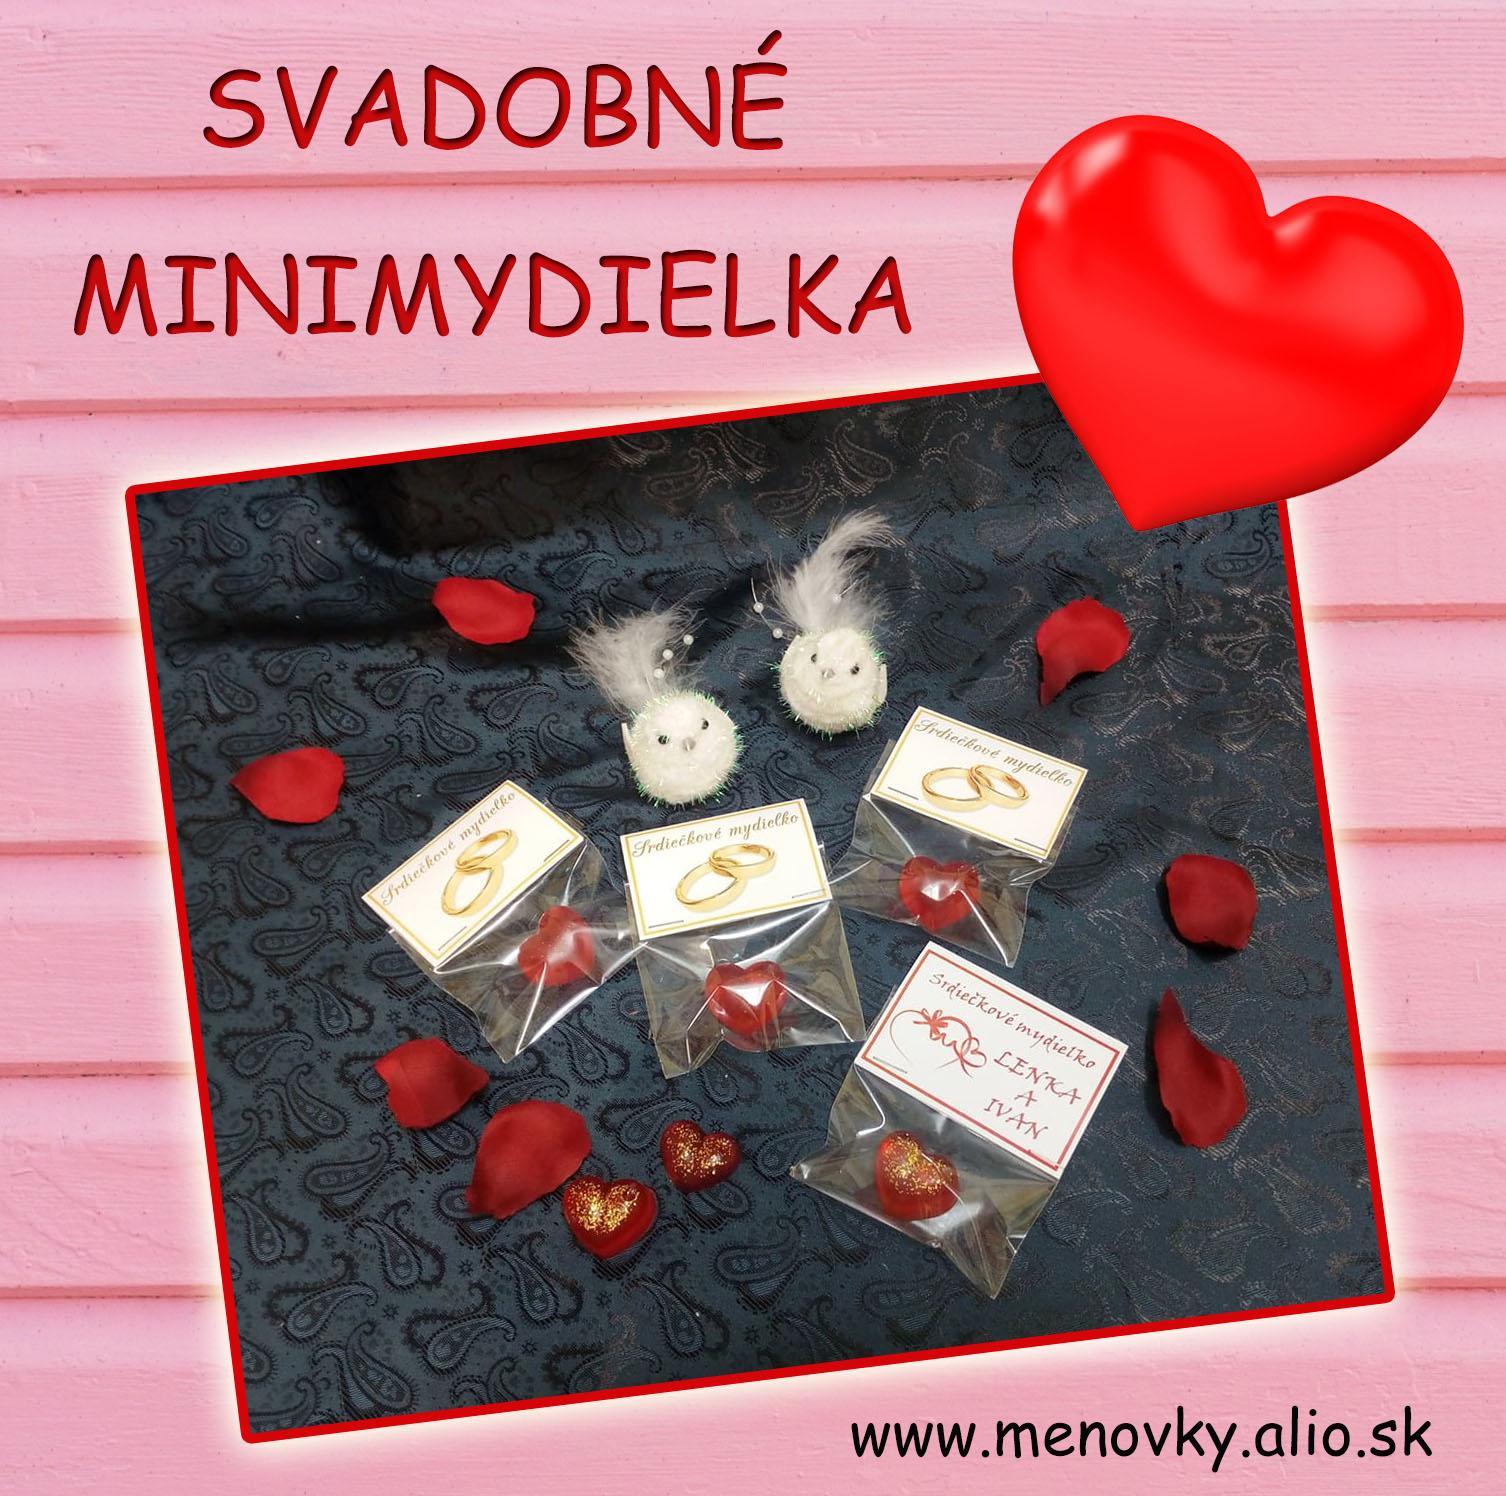 Svadobne mini  mydielka - glycerinove - Obrázok č. 1